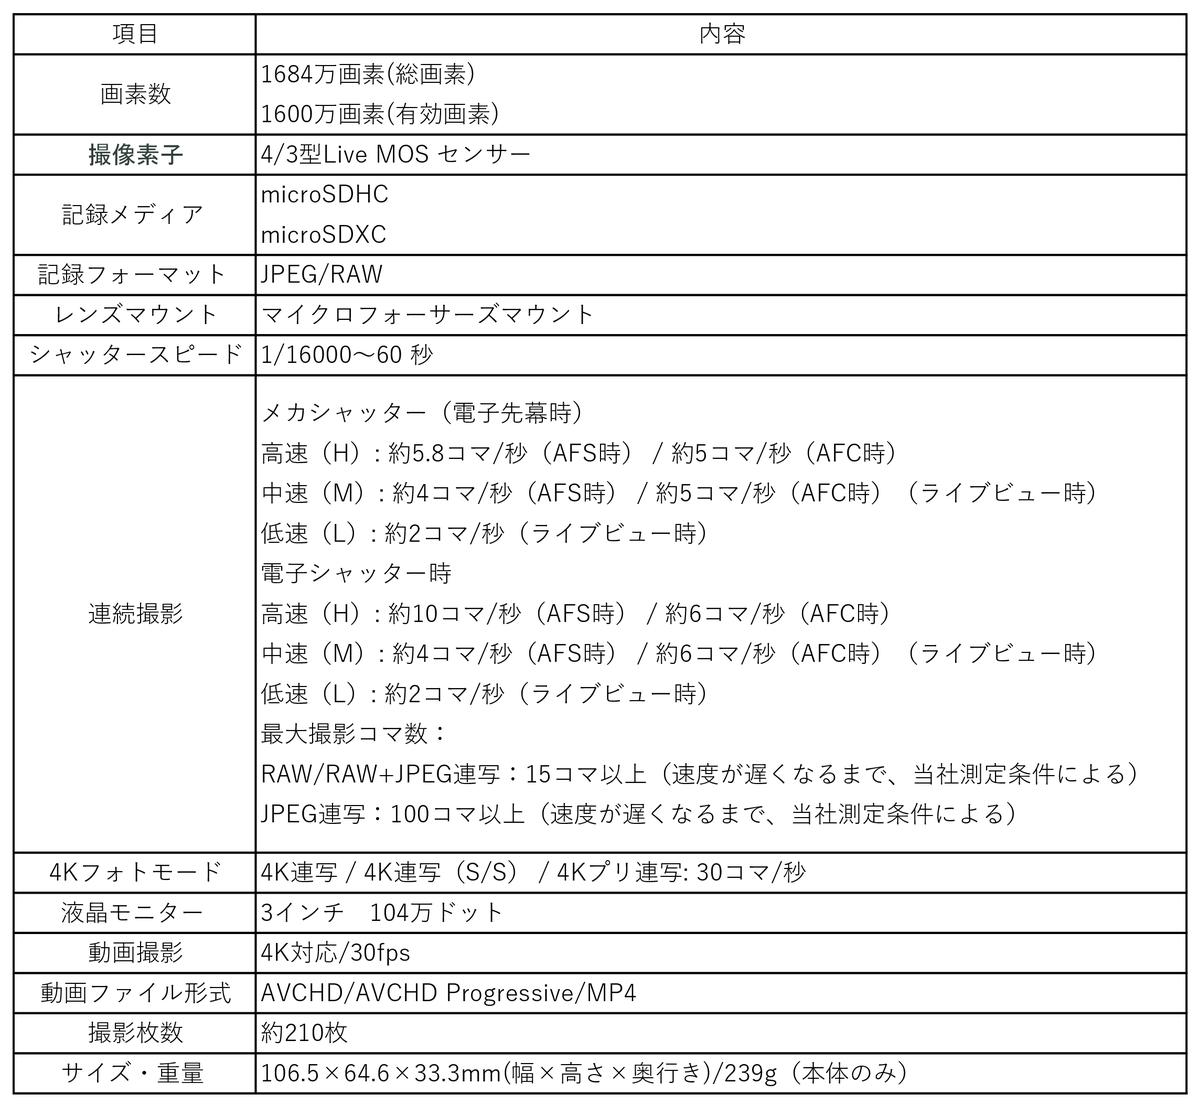 f:id:furutakeru:20190617190647p:plain